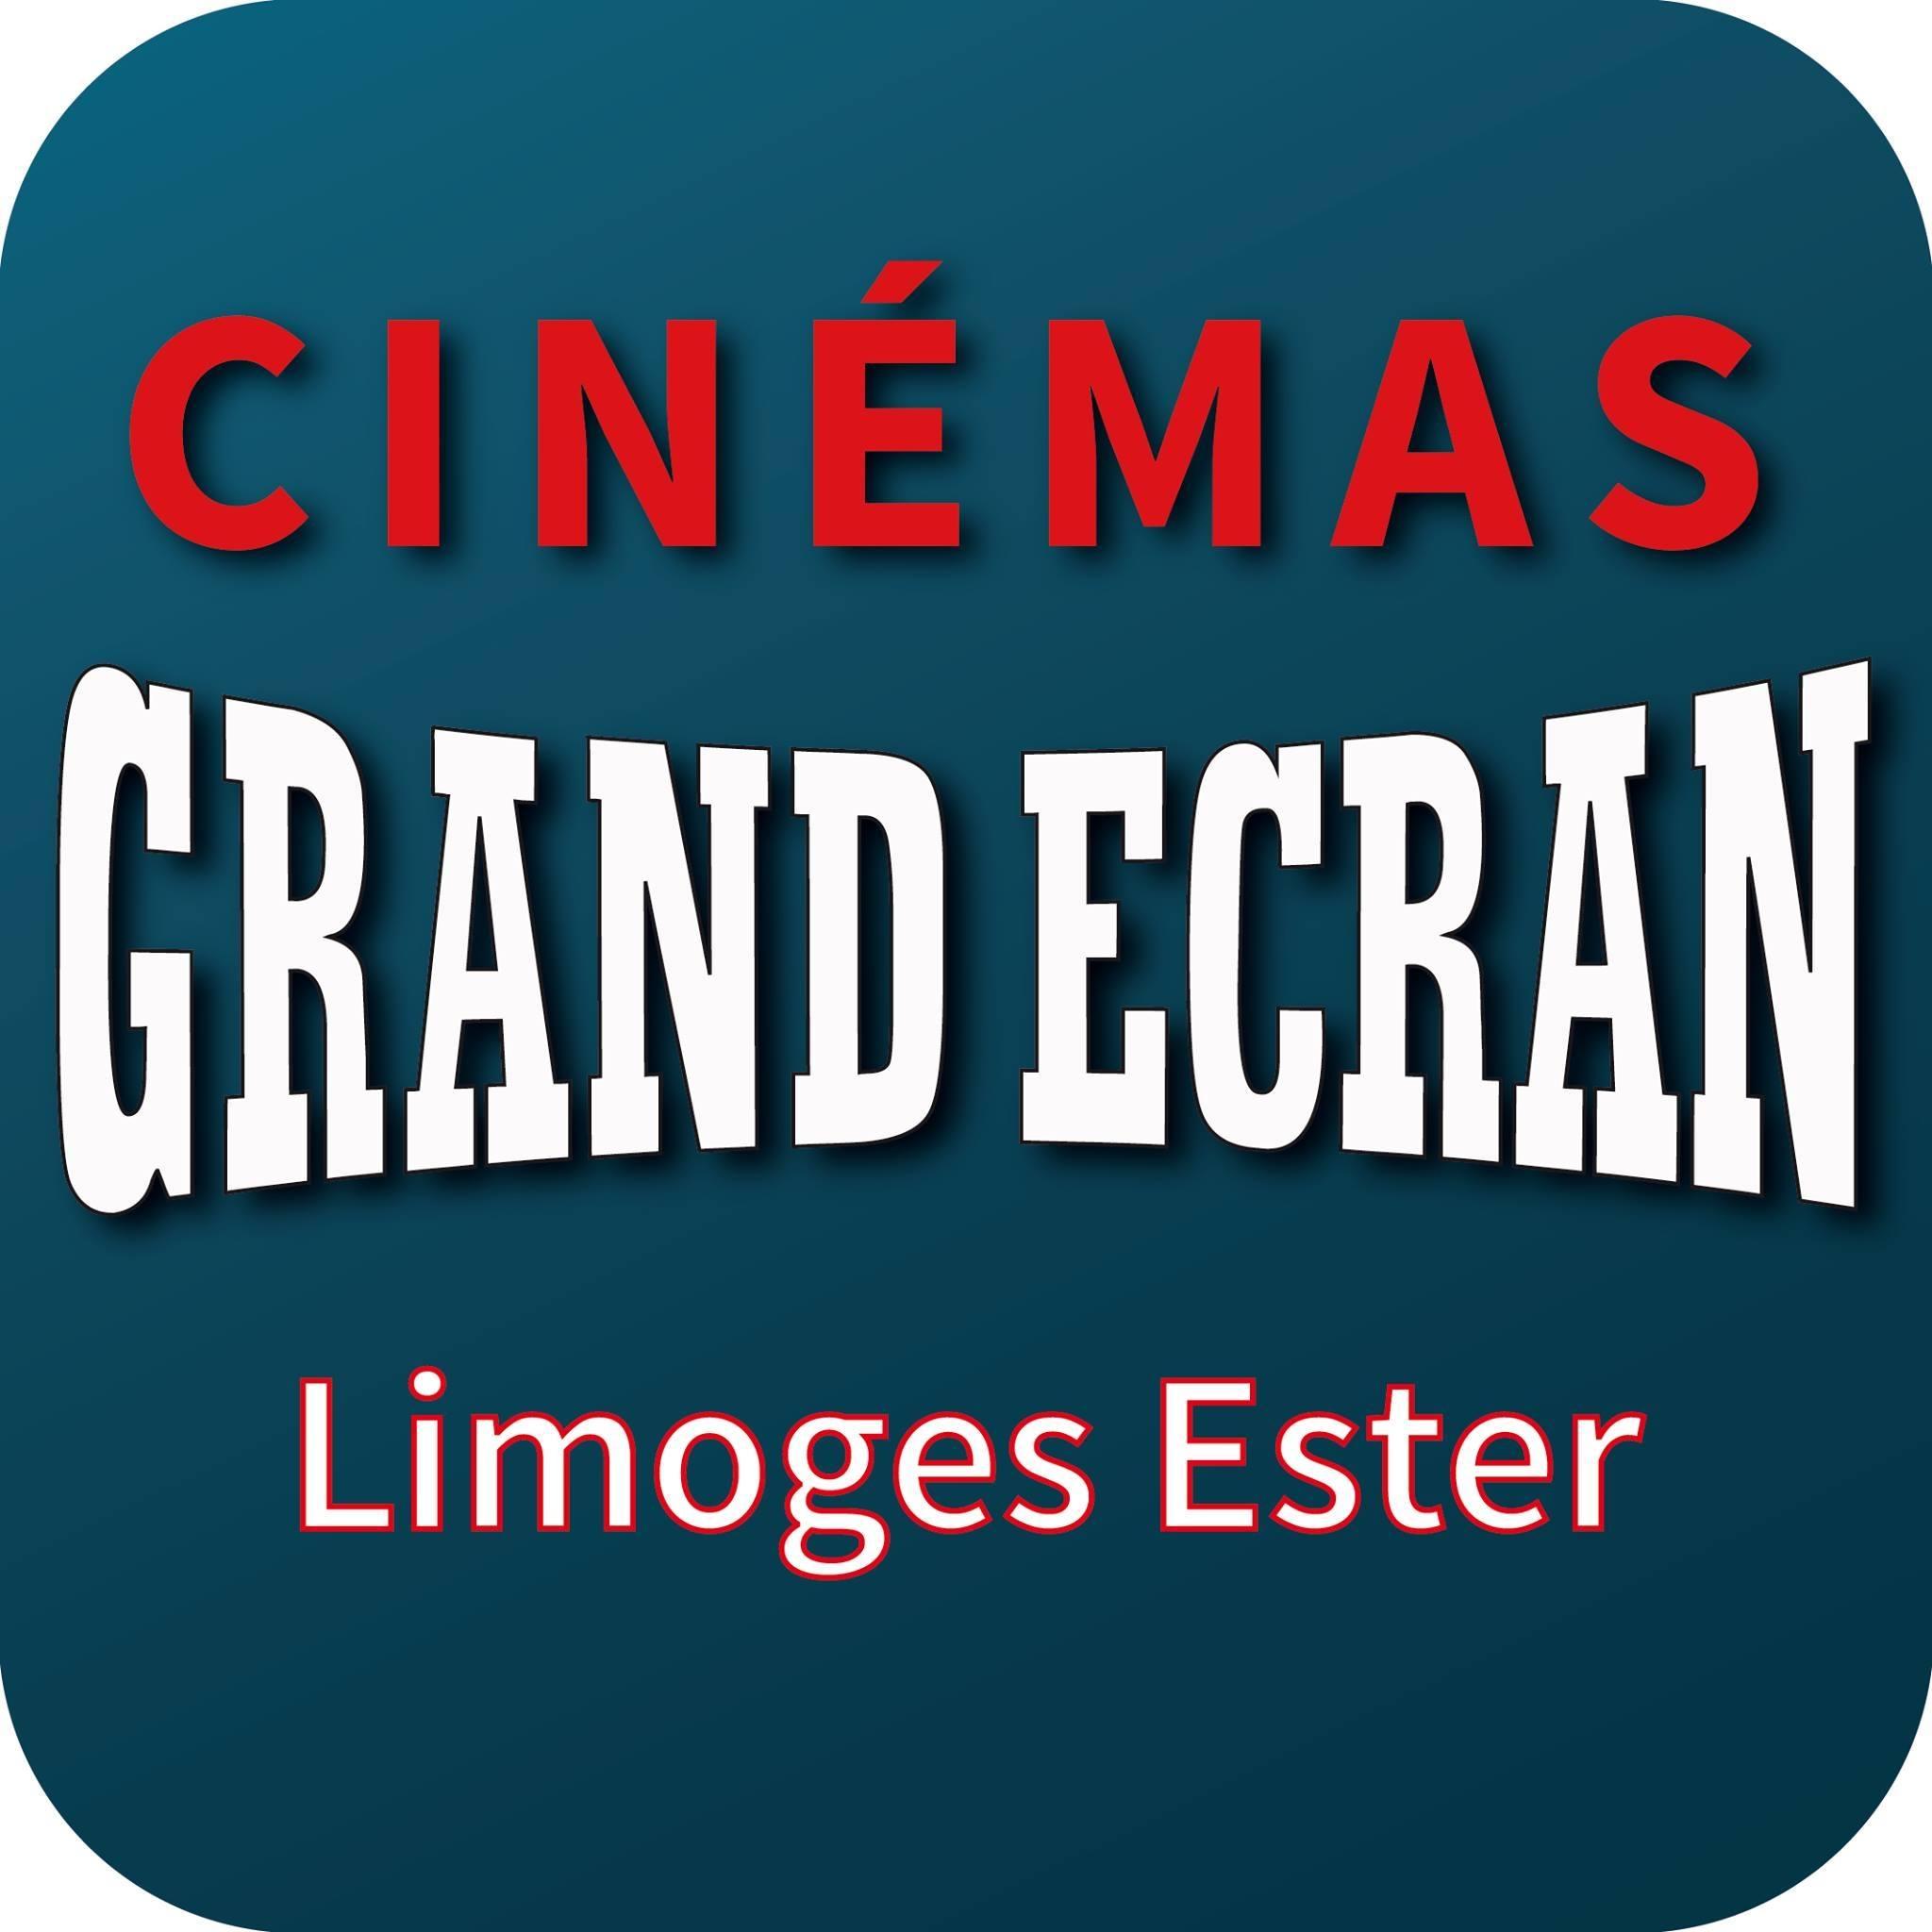 Mussidan si ges participe l 39 agrandissement du multiplex grand ecran ester limoges mussidan - Cinema grand ecran limoges ...